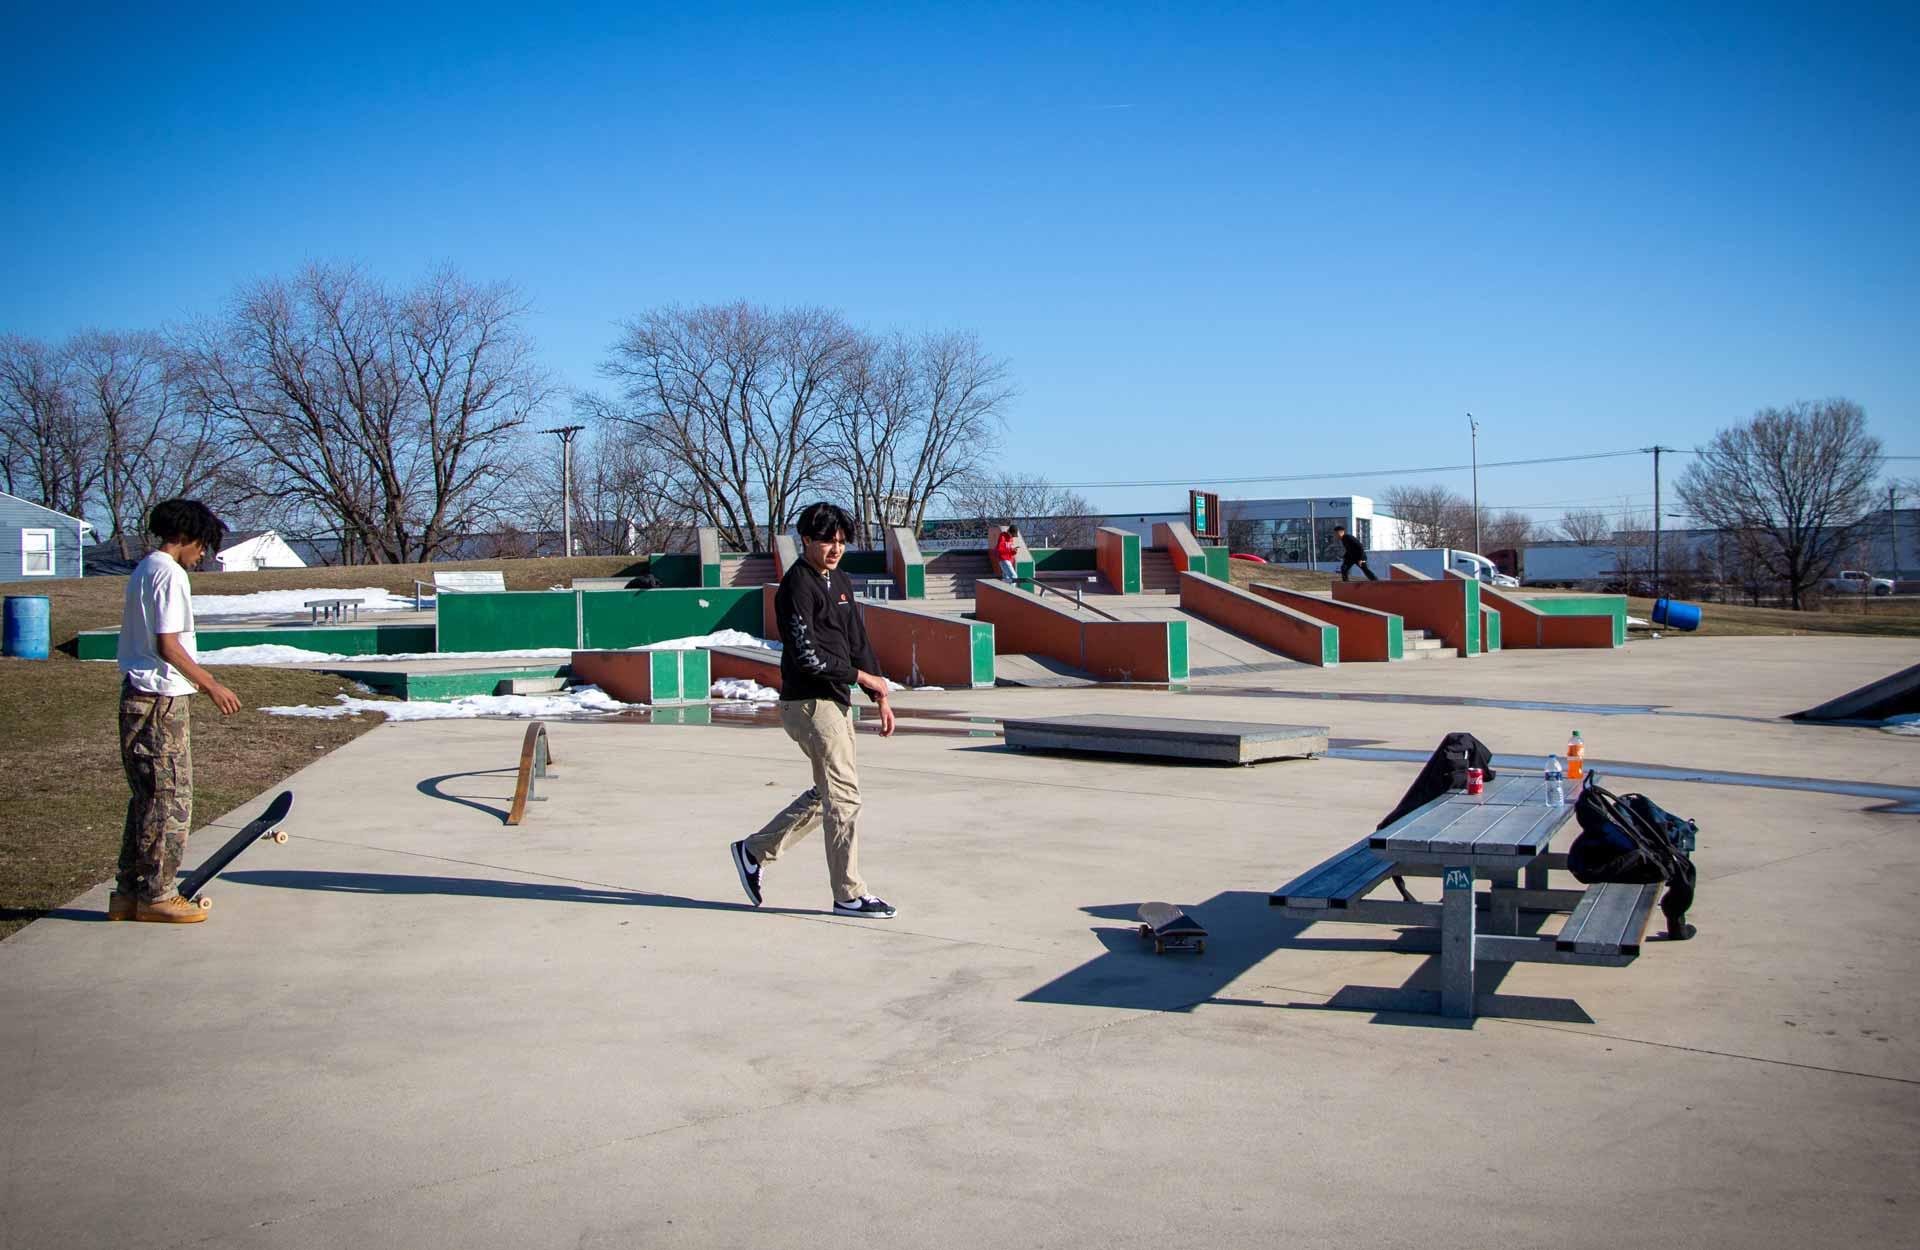 Bolingbrook Park District Central Park Skate Plaza